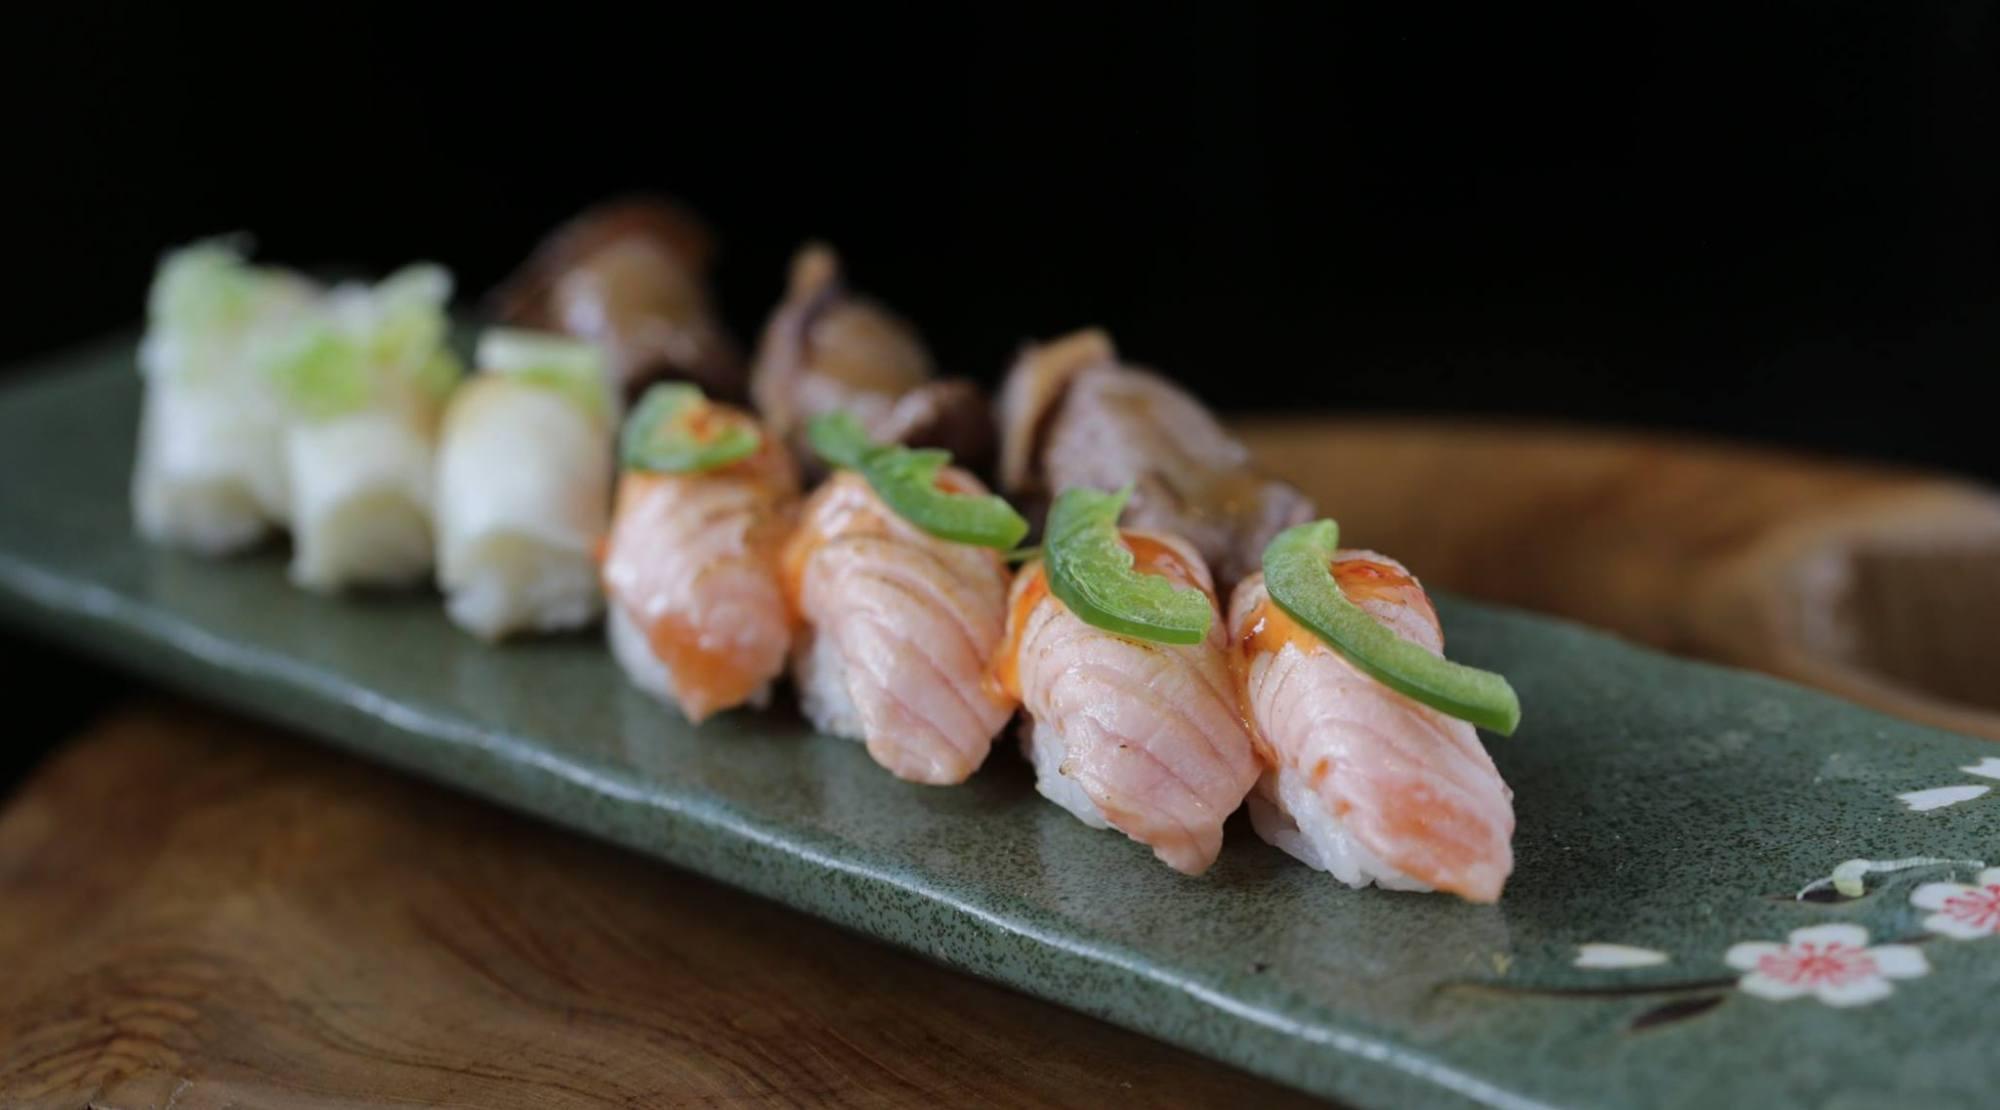 10 of the best sushi restaurants in Markham